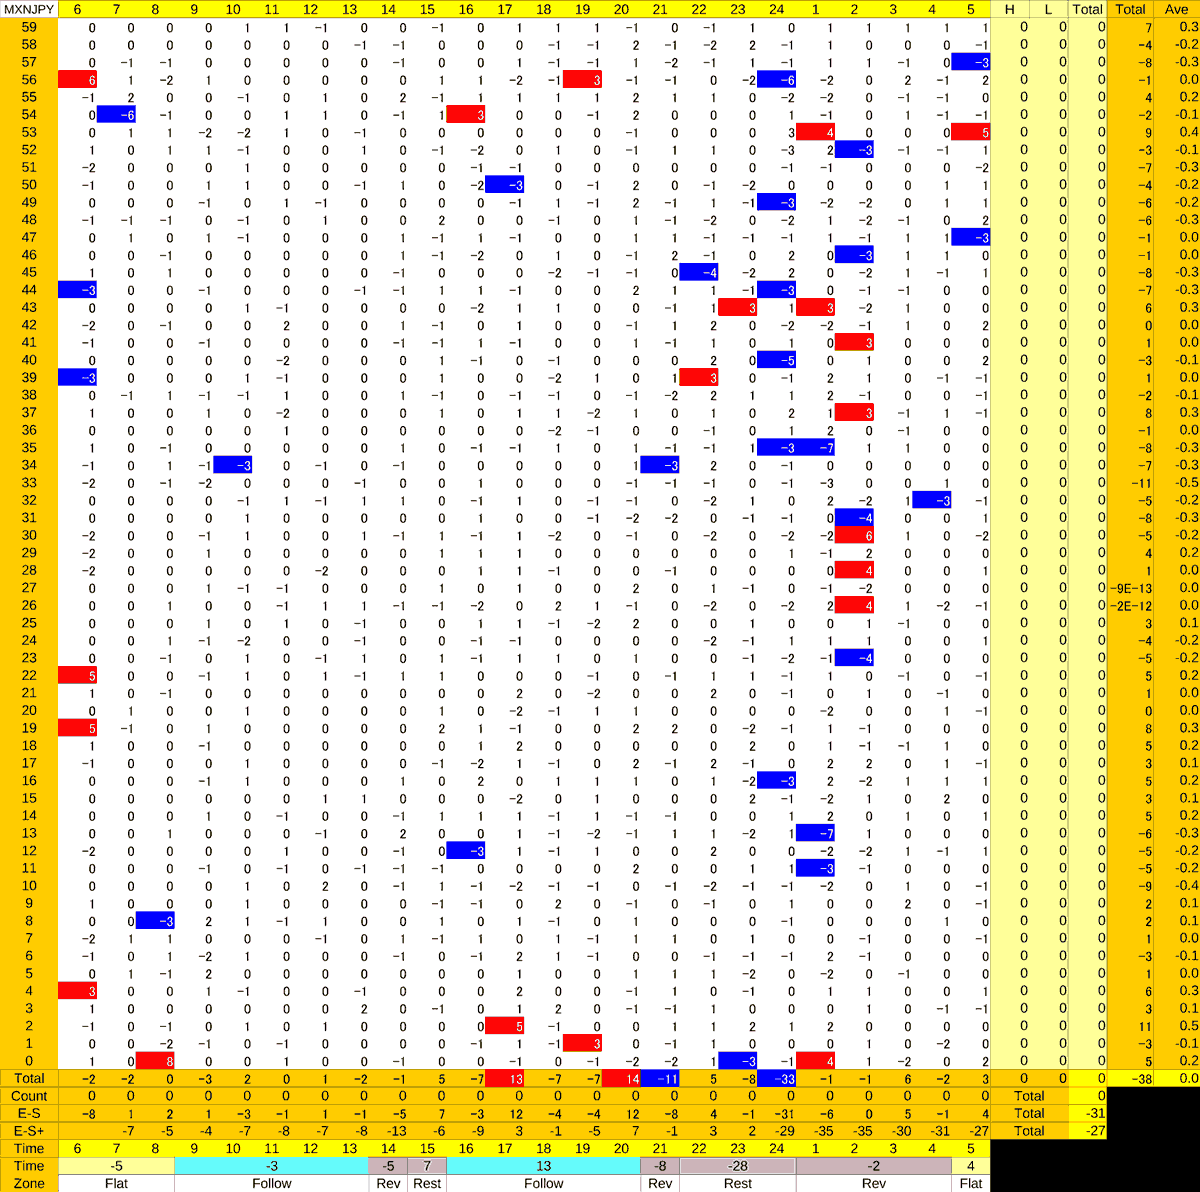 20201218_HS(3)MXNJPY